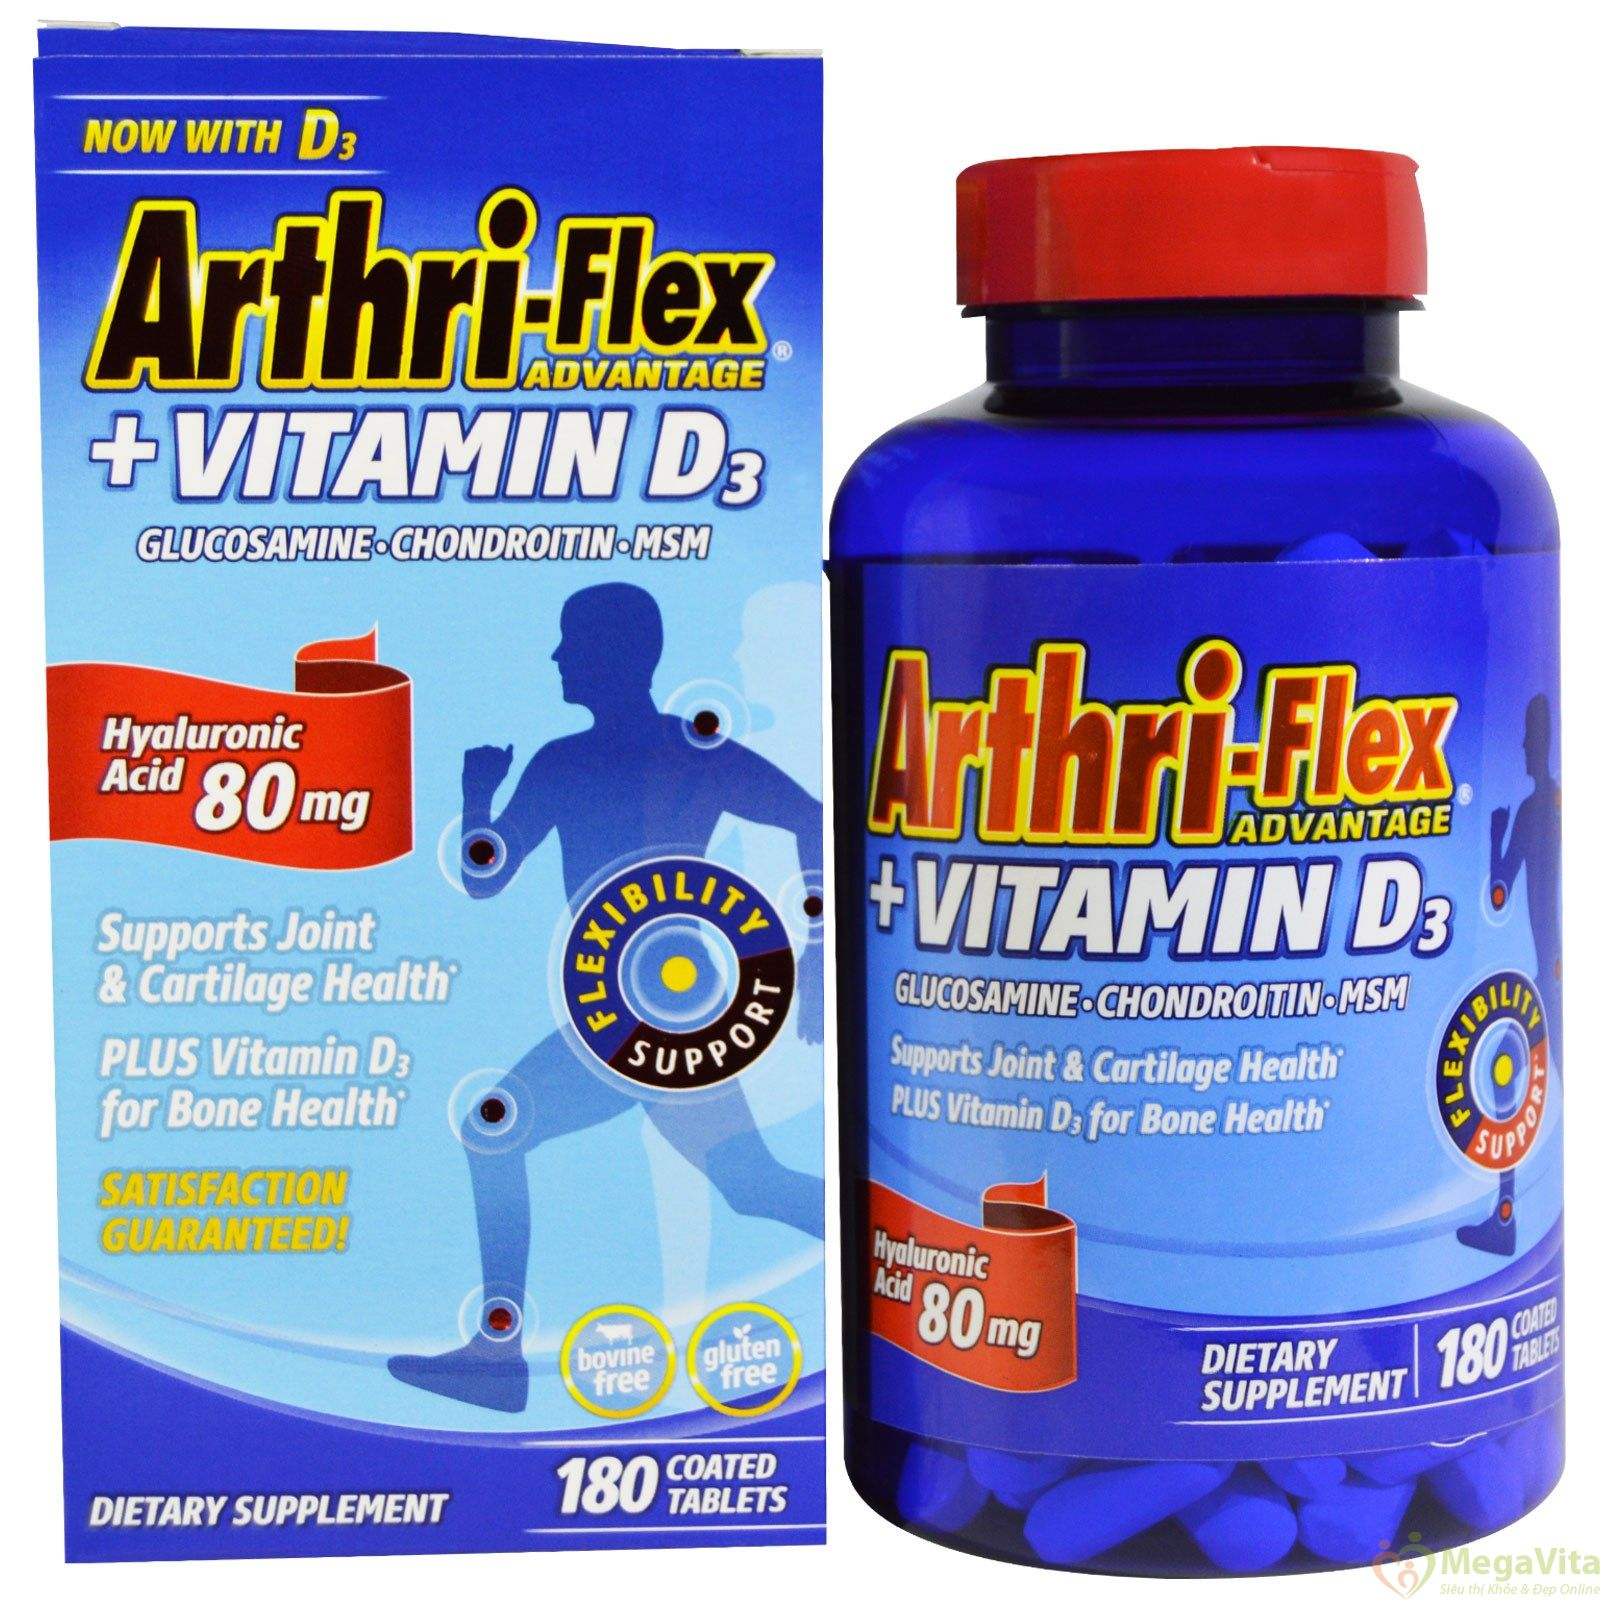 Arthri - flex advantage